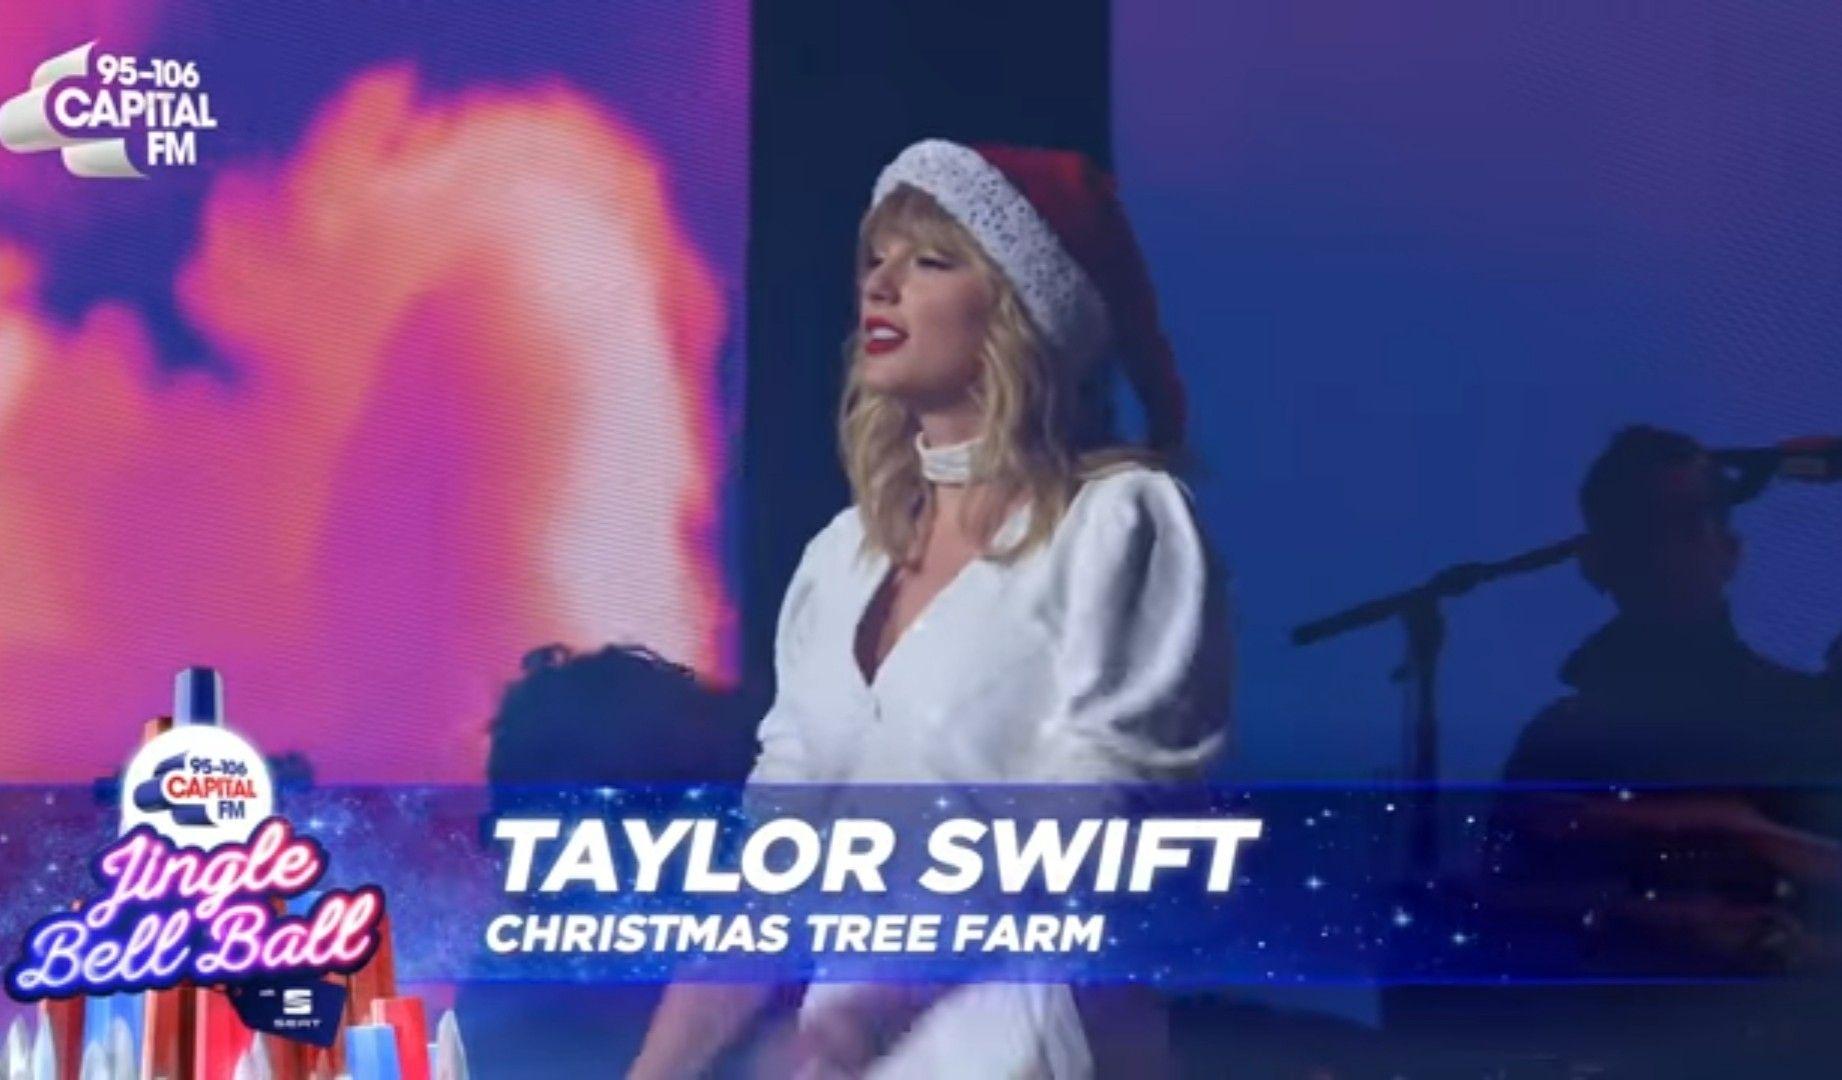 Pin by Dania on love taylor swift Christmas tree farm